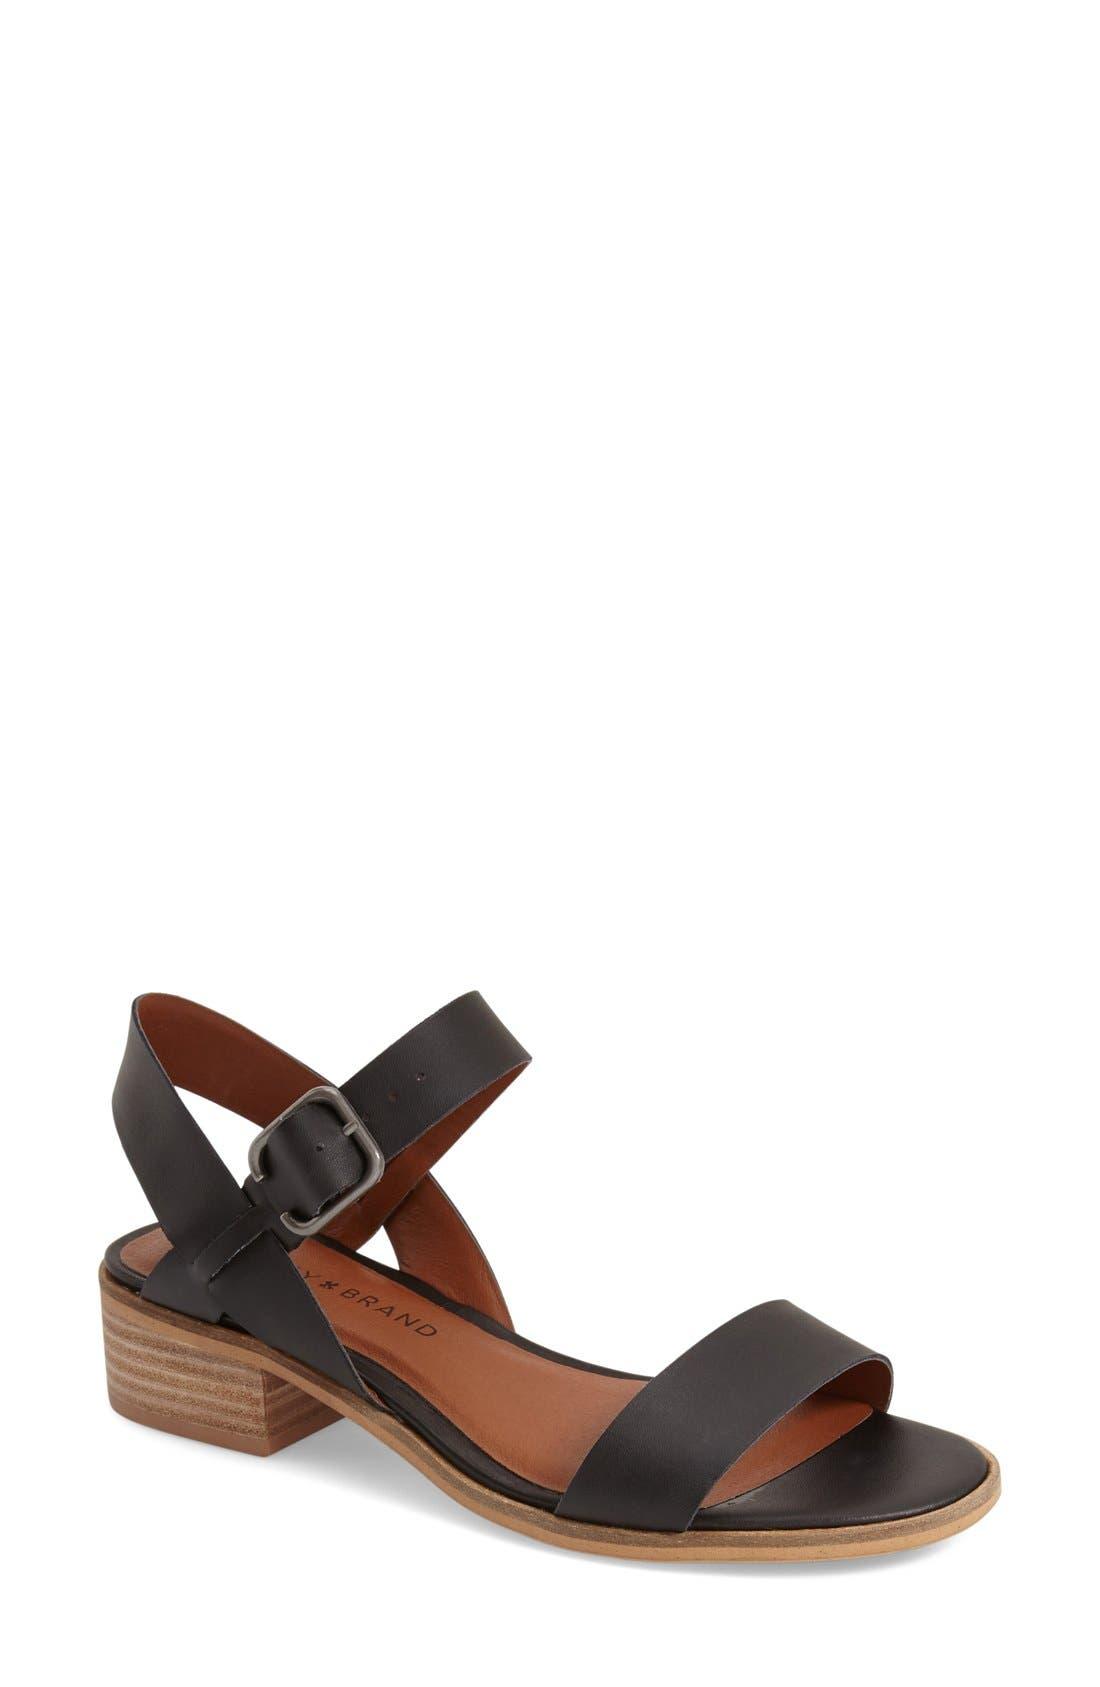 Main Image - Lucky Brand 'Toni' Stacked Heel Sandal (Women)